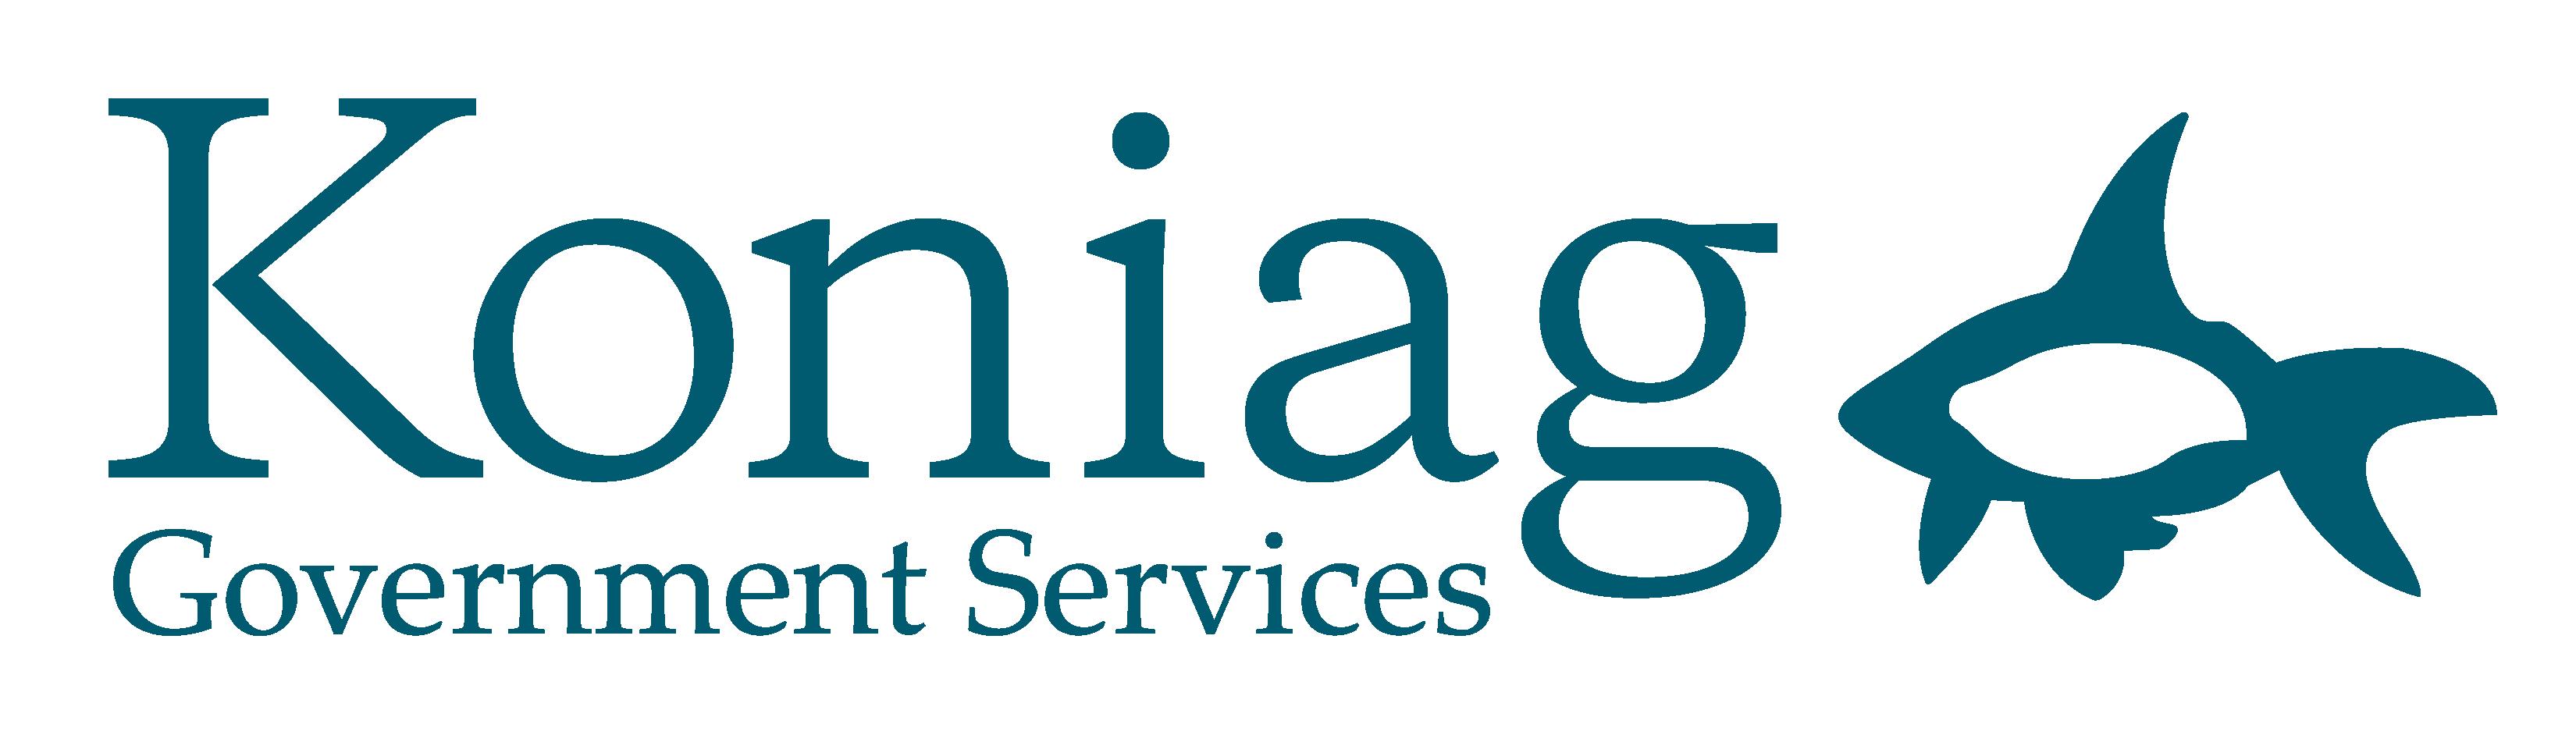 Koniag Government Services - logo image